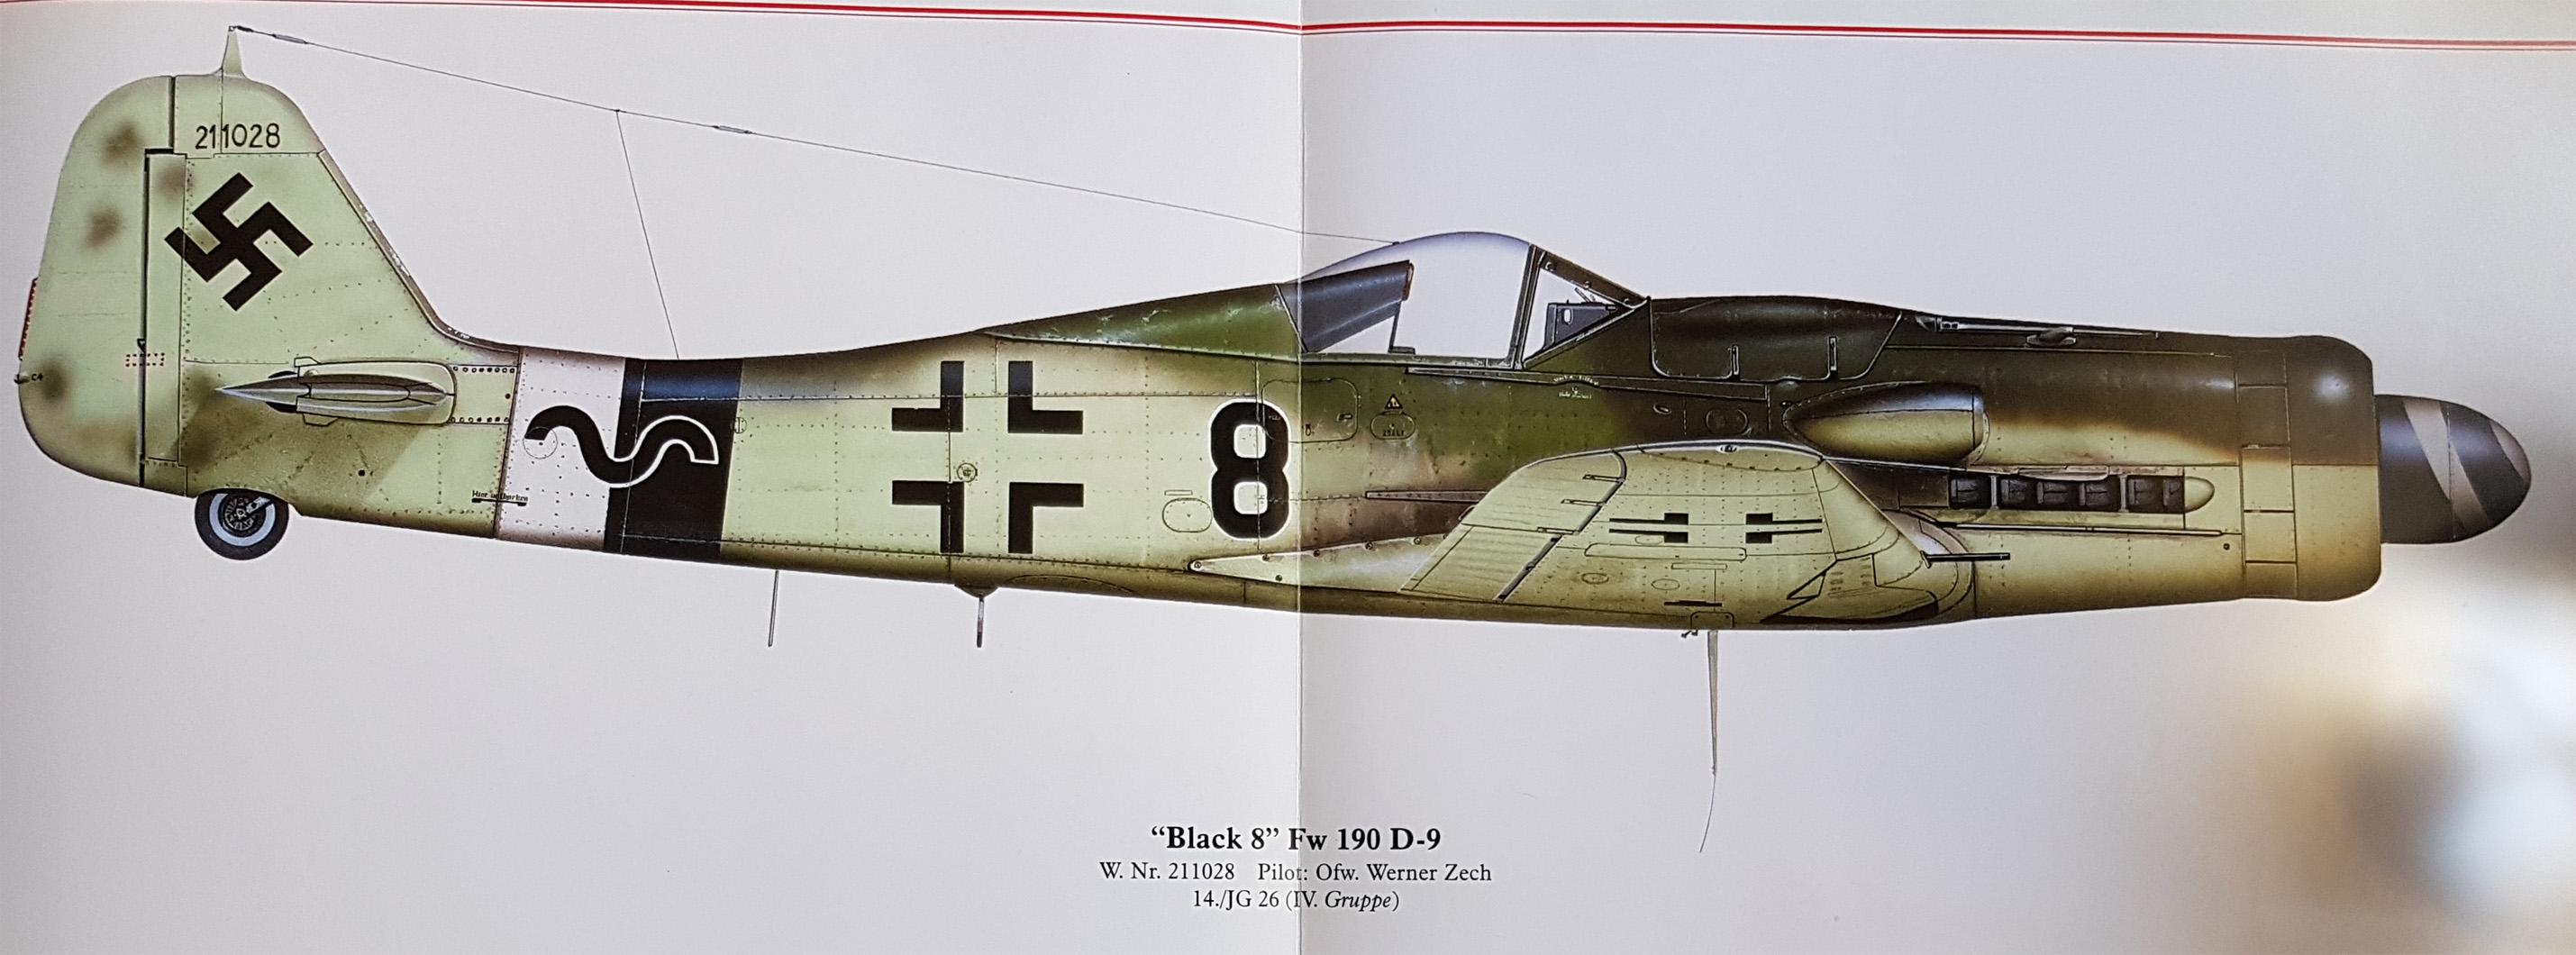 FW-190-D9.jpg